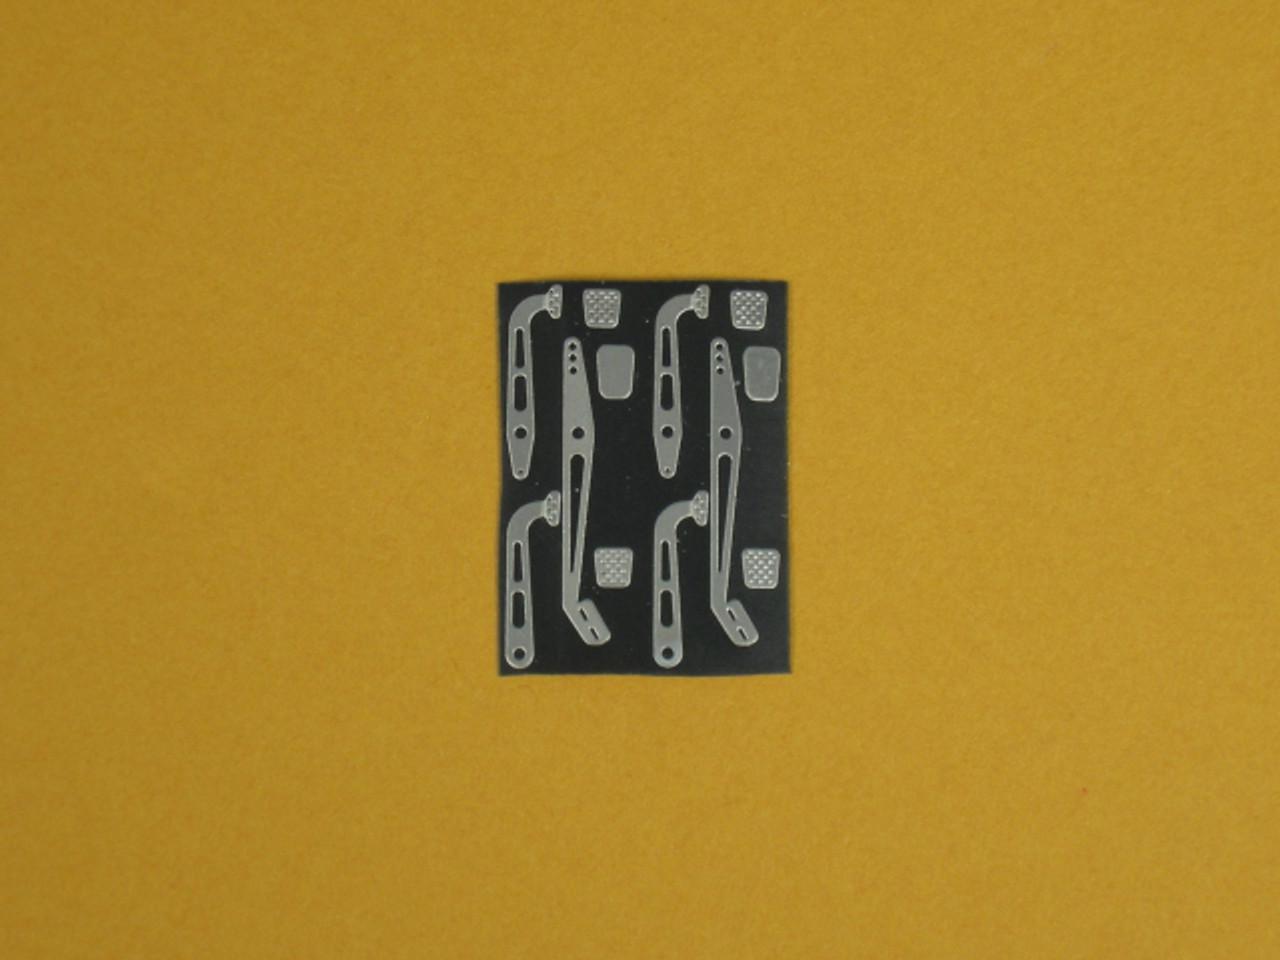 Pedal Set for FC, PM or Door Slammer 1/25